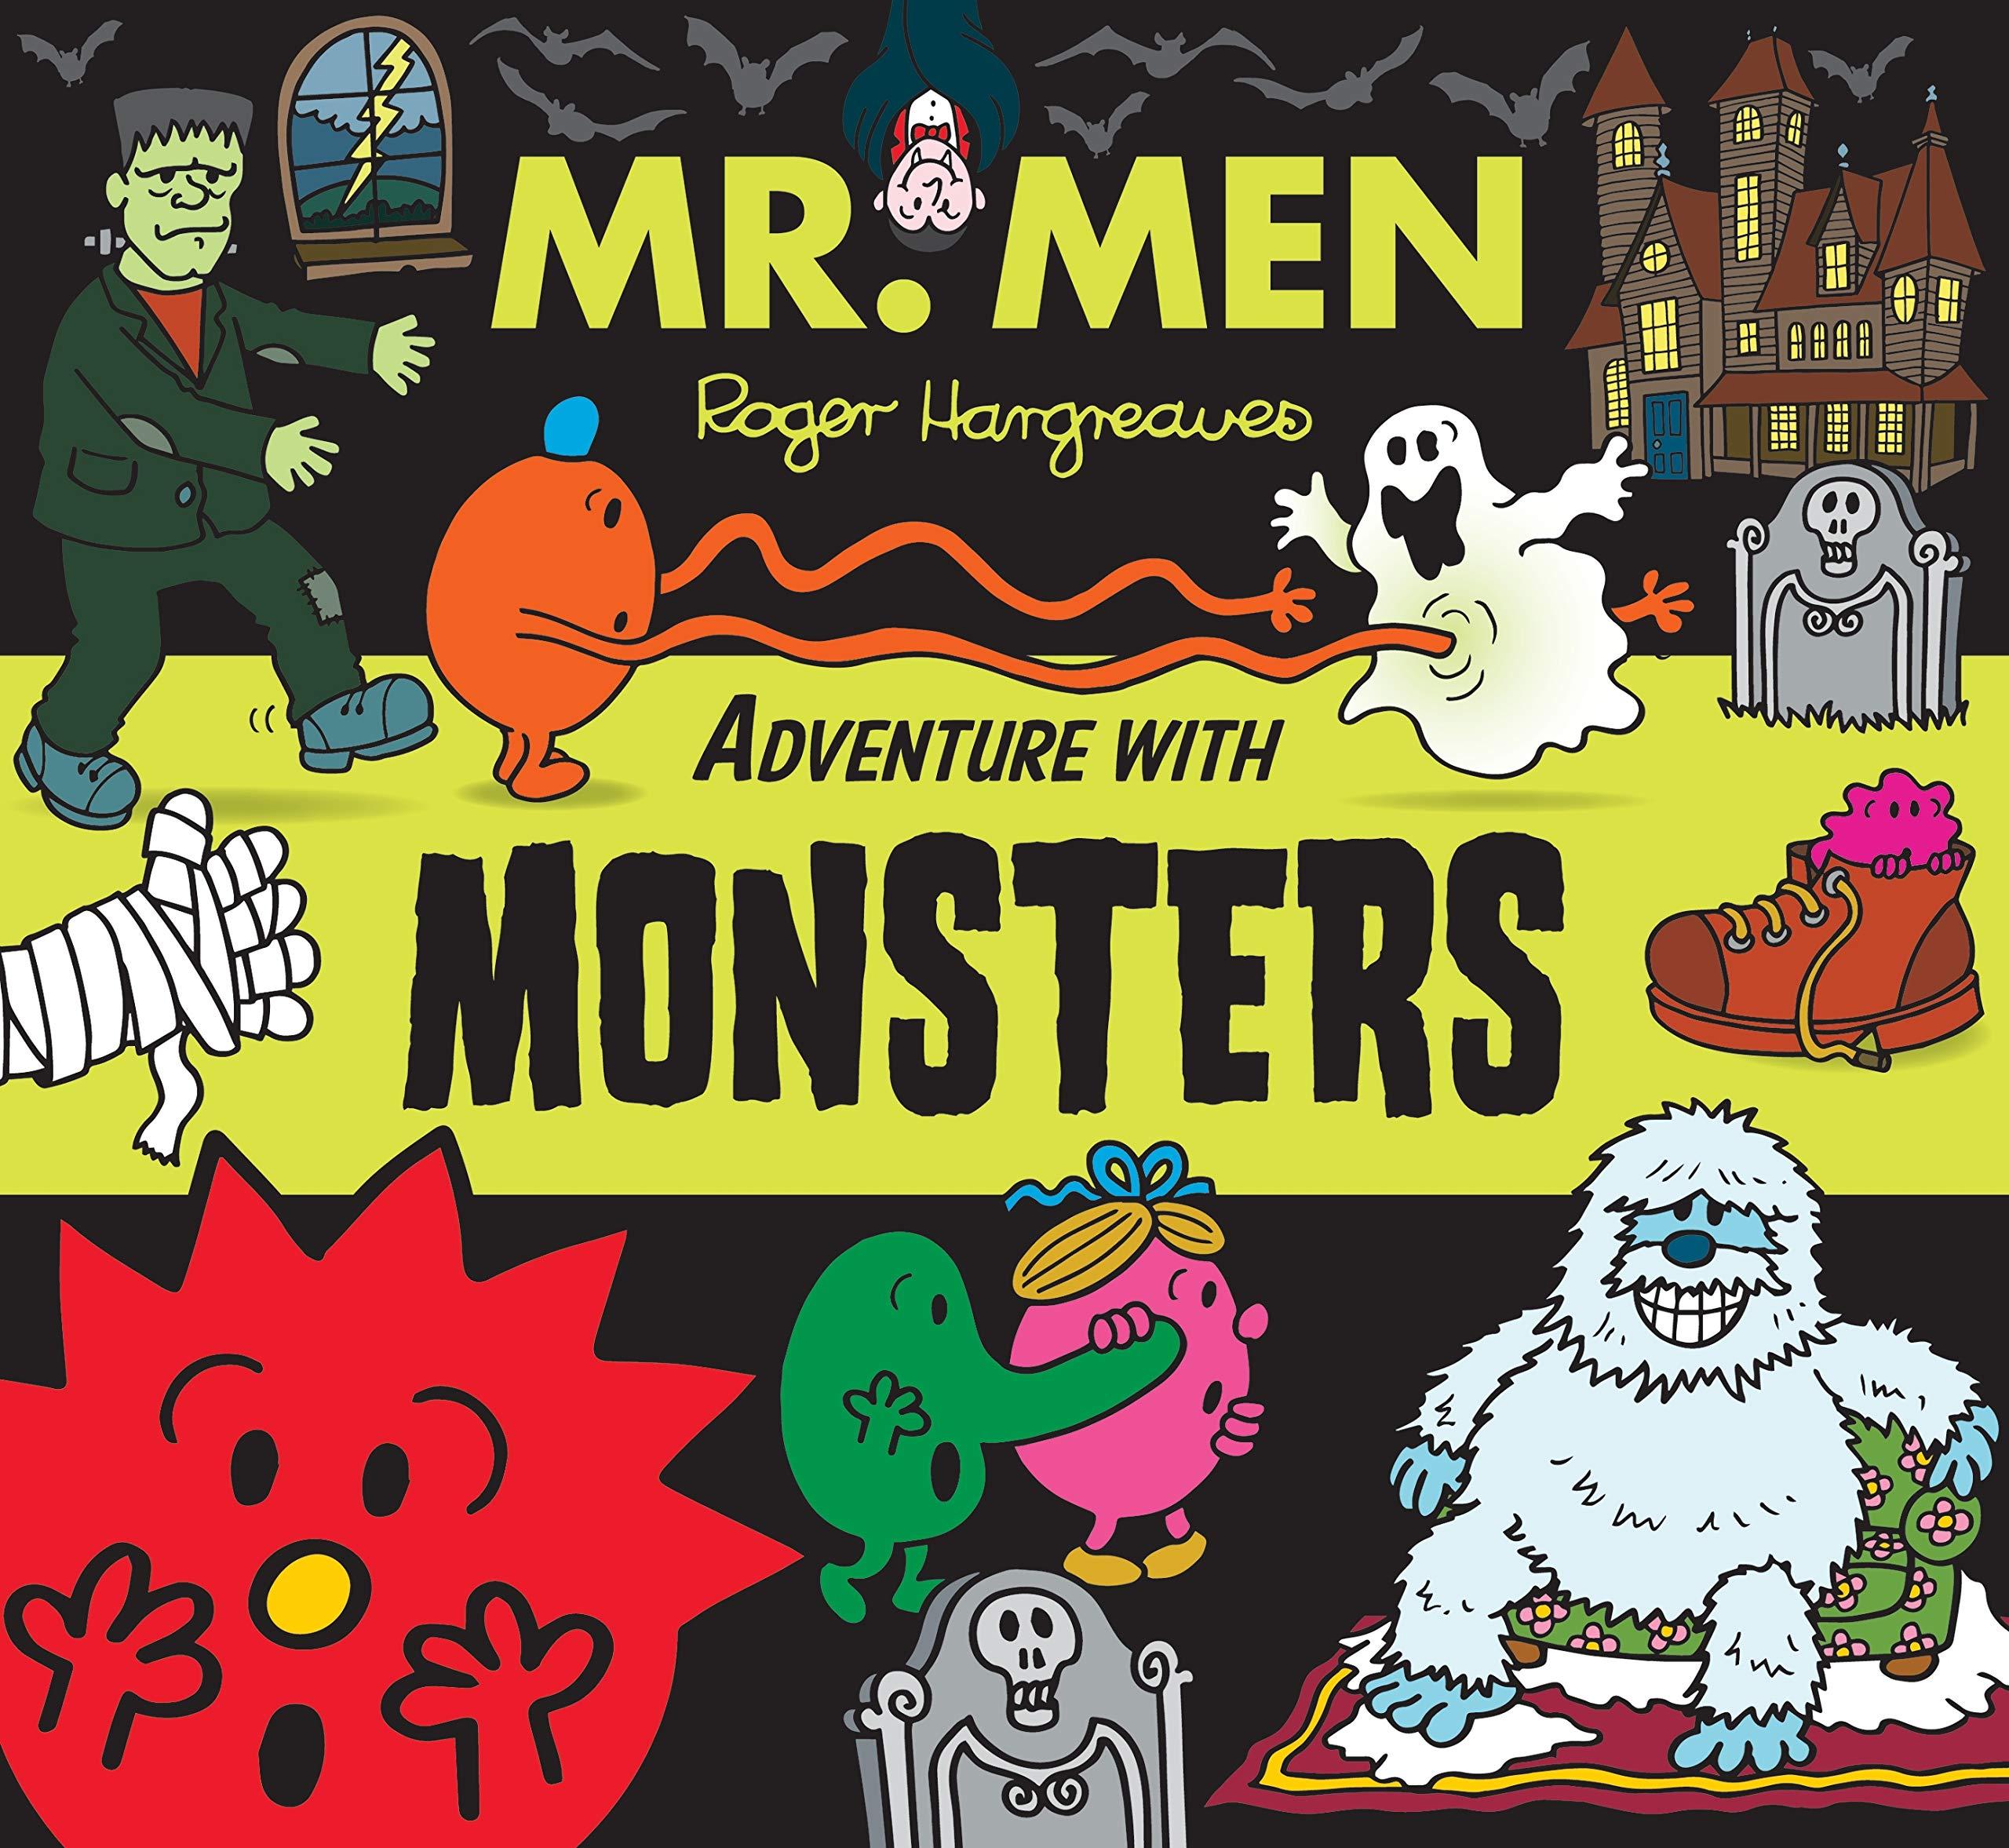 Mr. Men - Adventure with Monsters